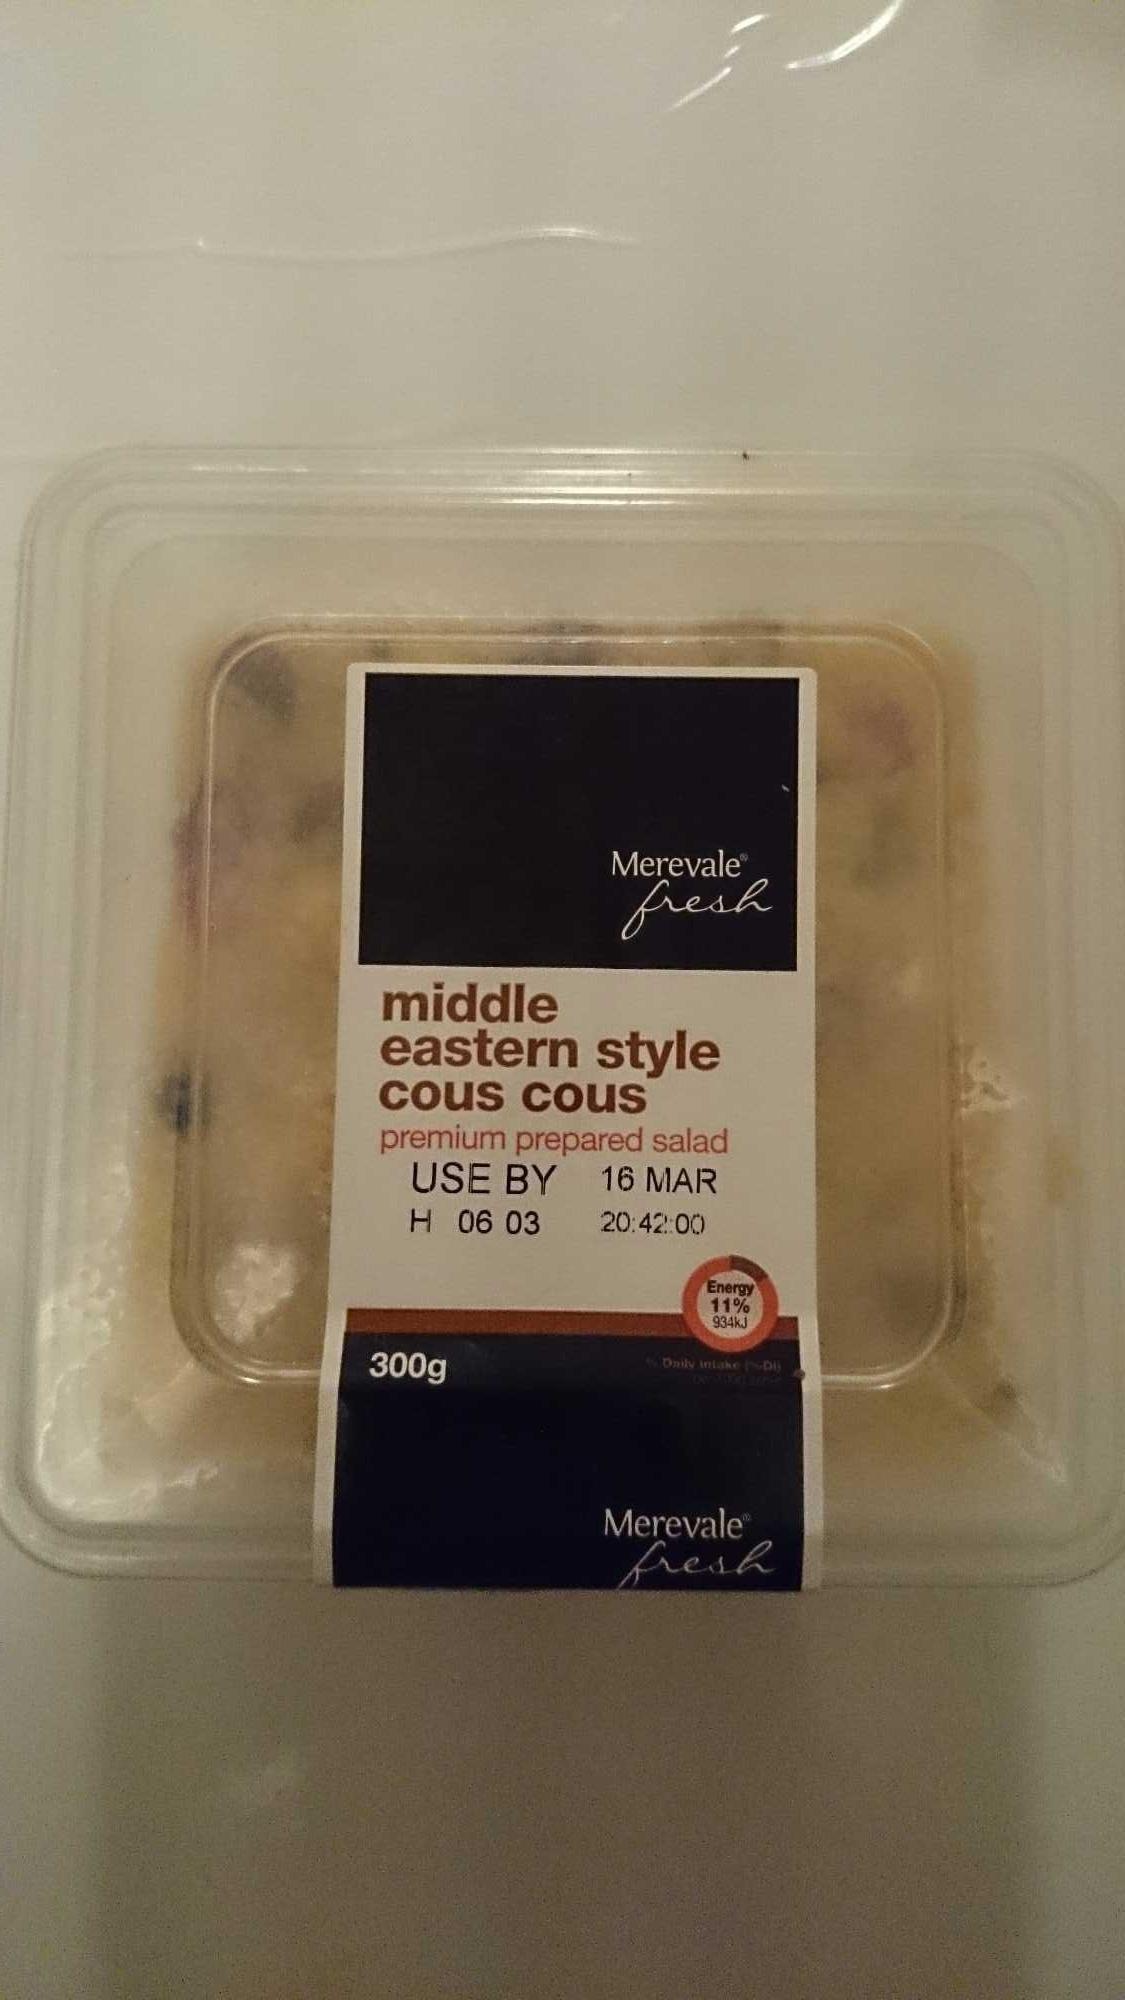 Middle Eastern Style Cous Cous Premium Prepared Salad - Product - en